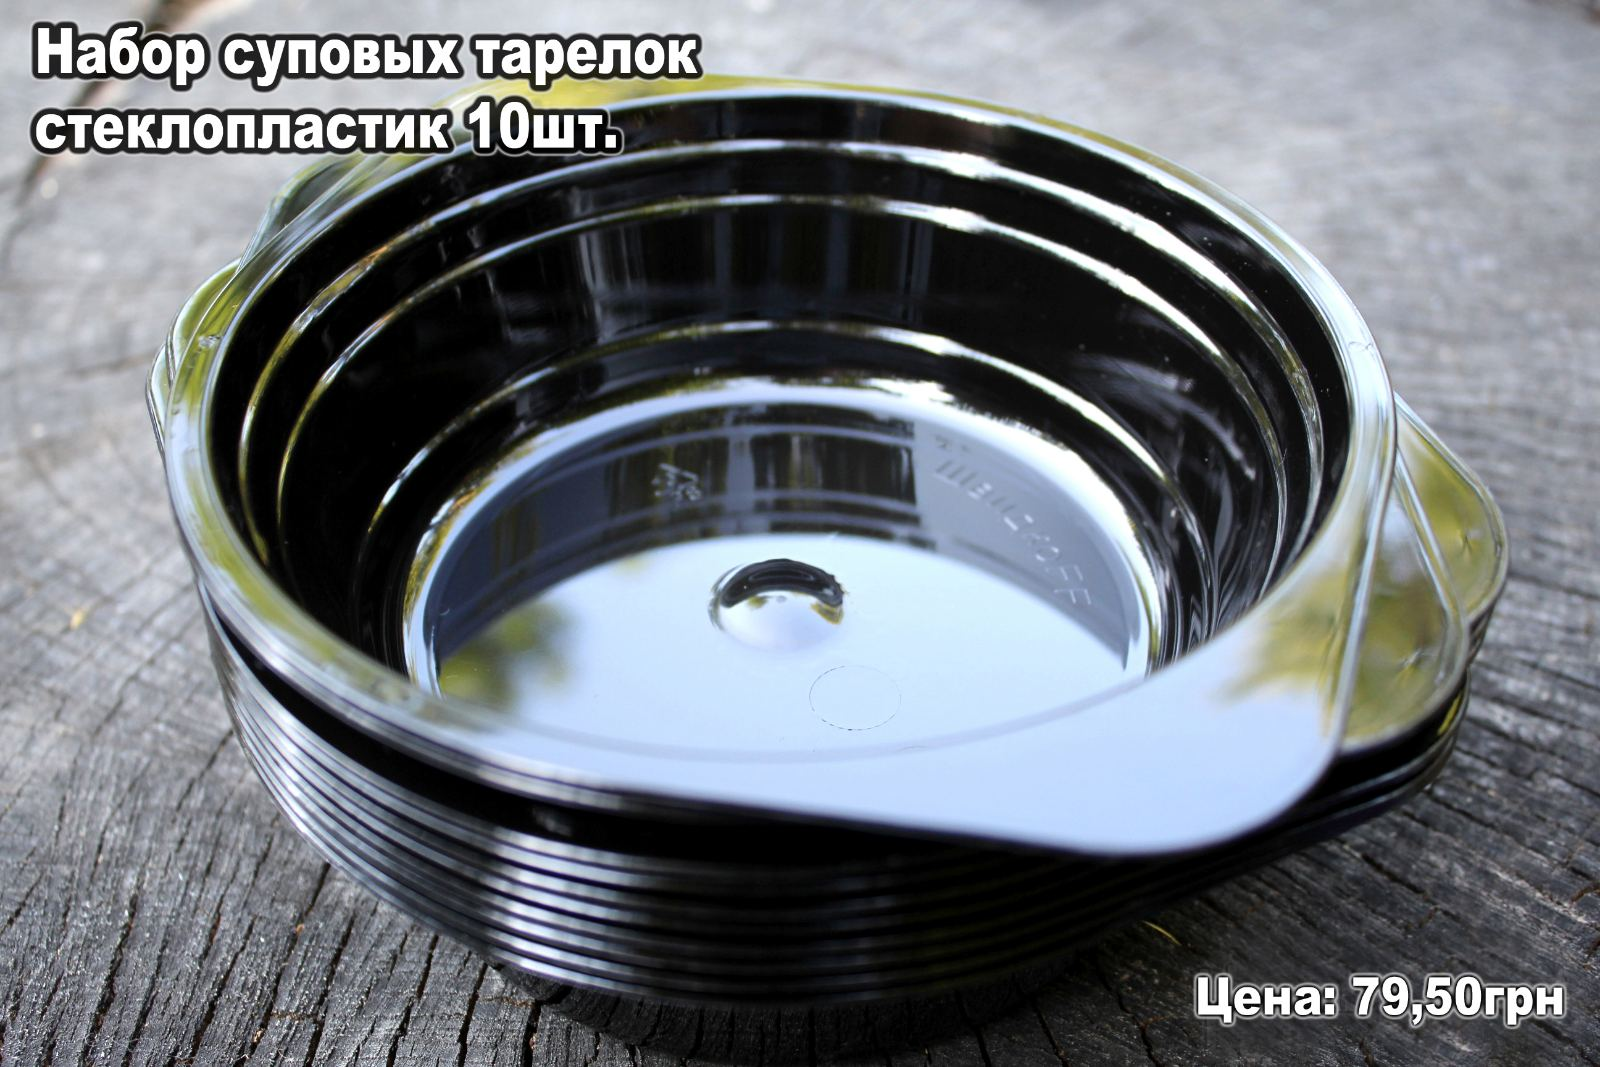 суп тарелки стеклопластик